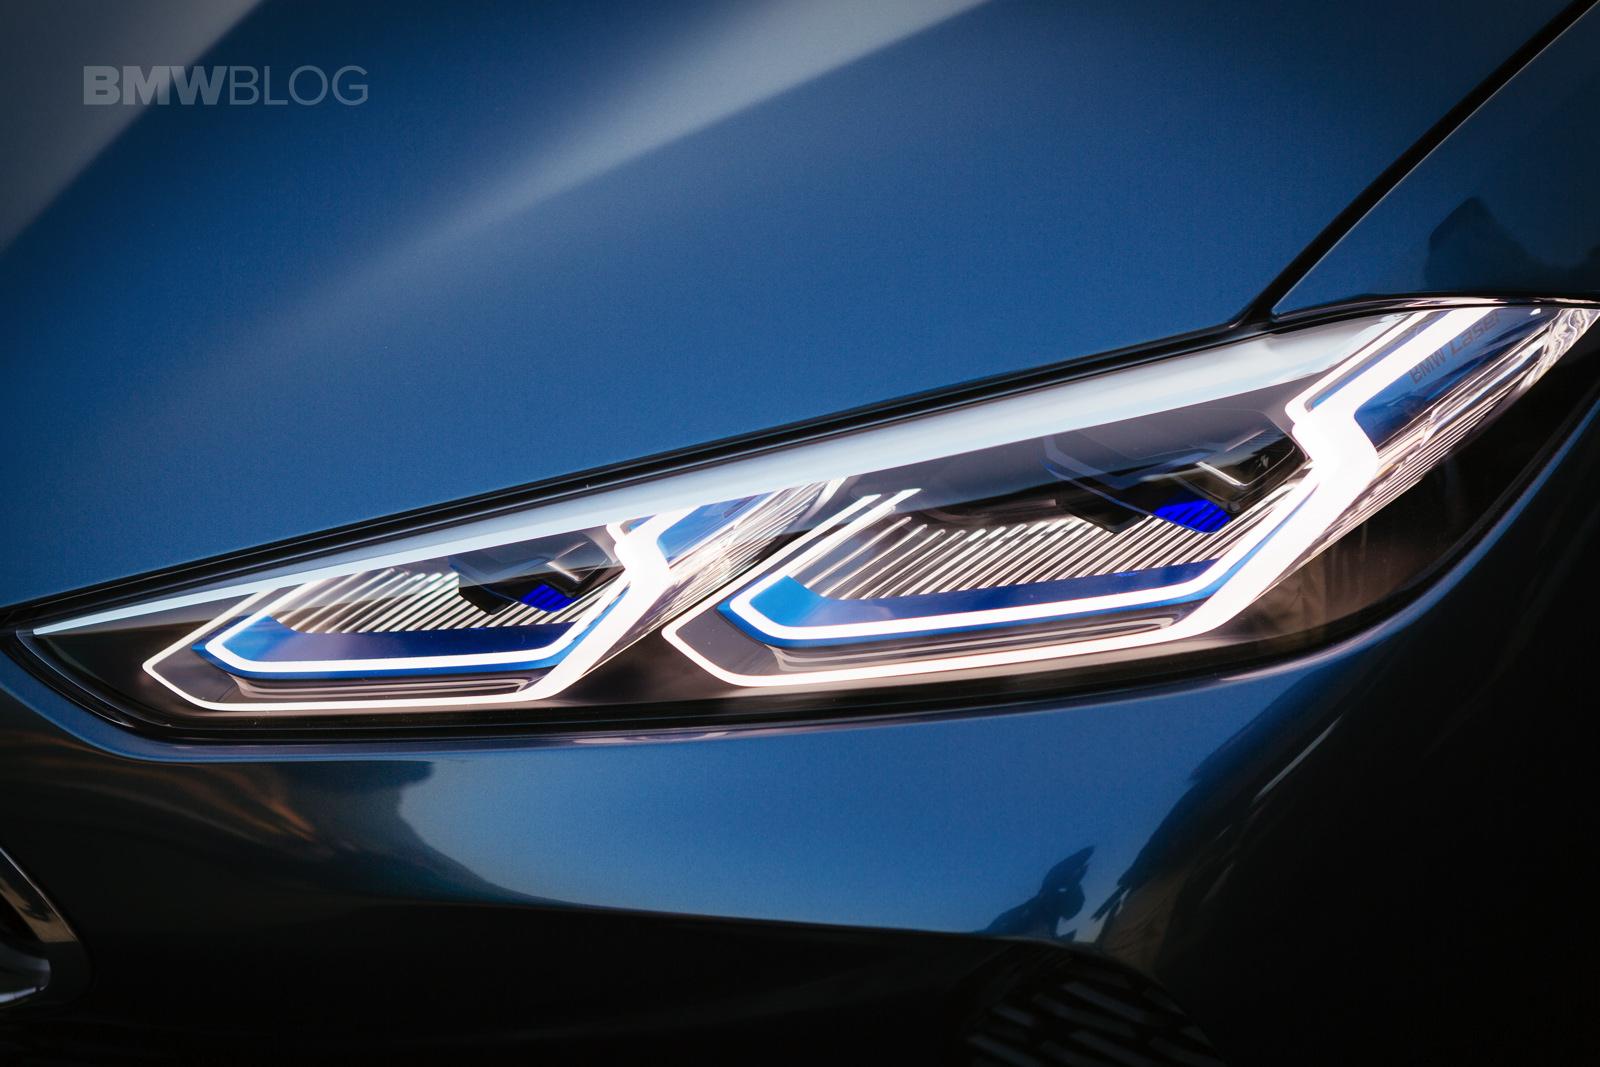 BMW-Concept-8-Series-Villa-deste-2017-50